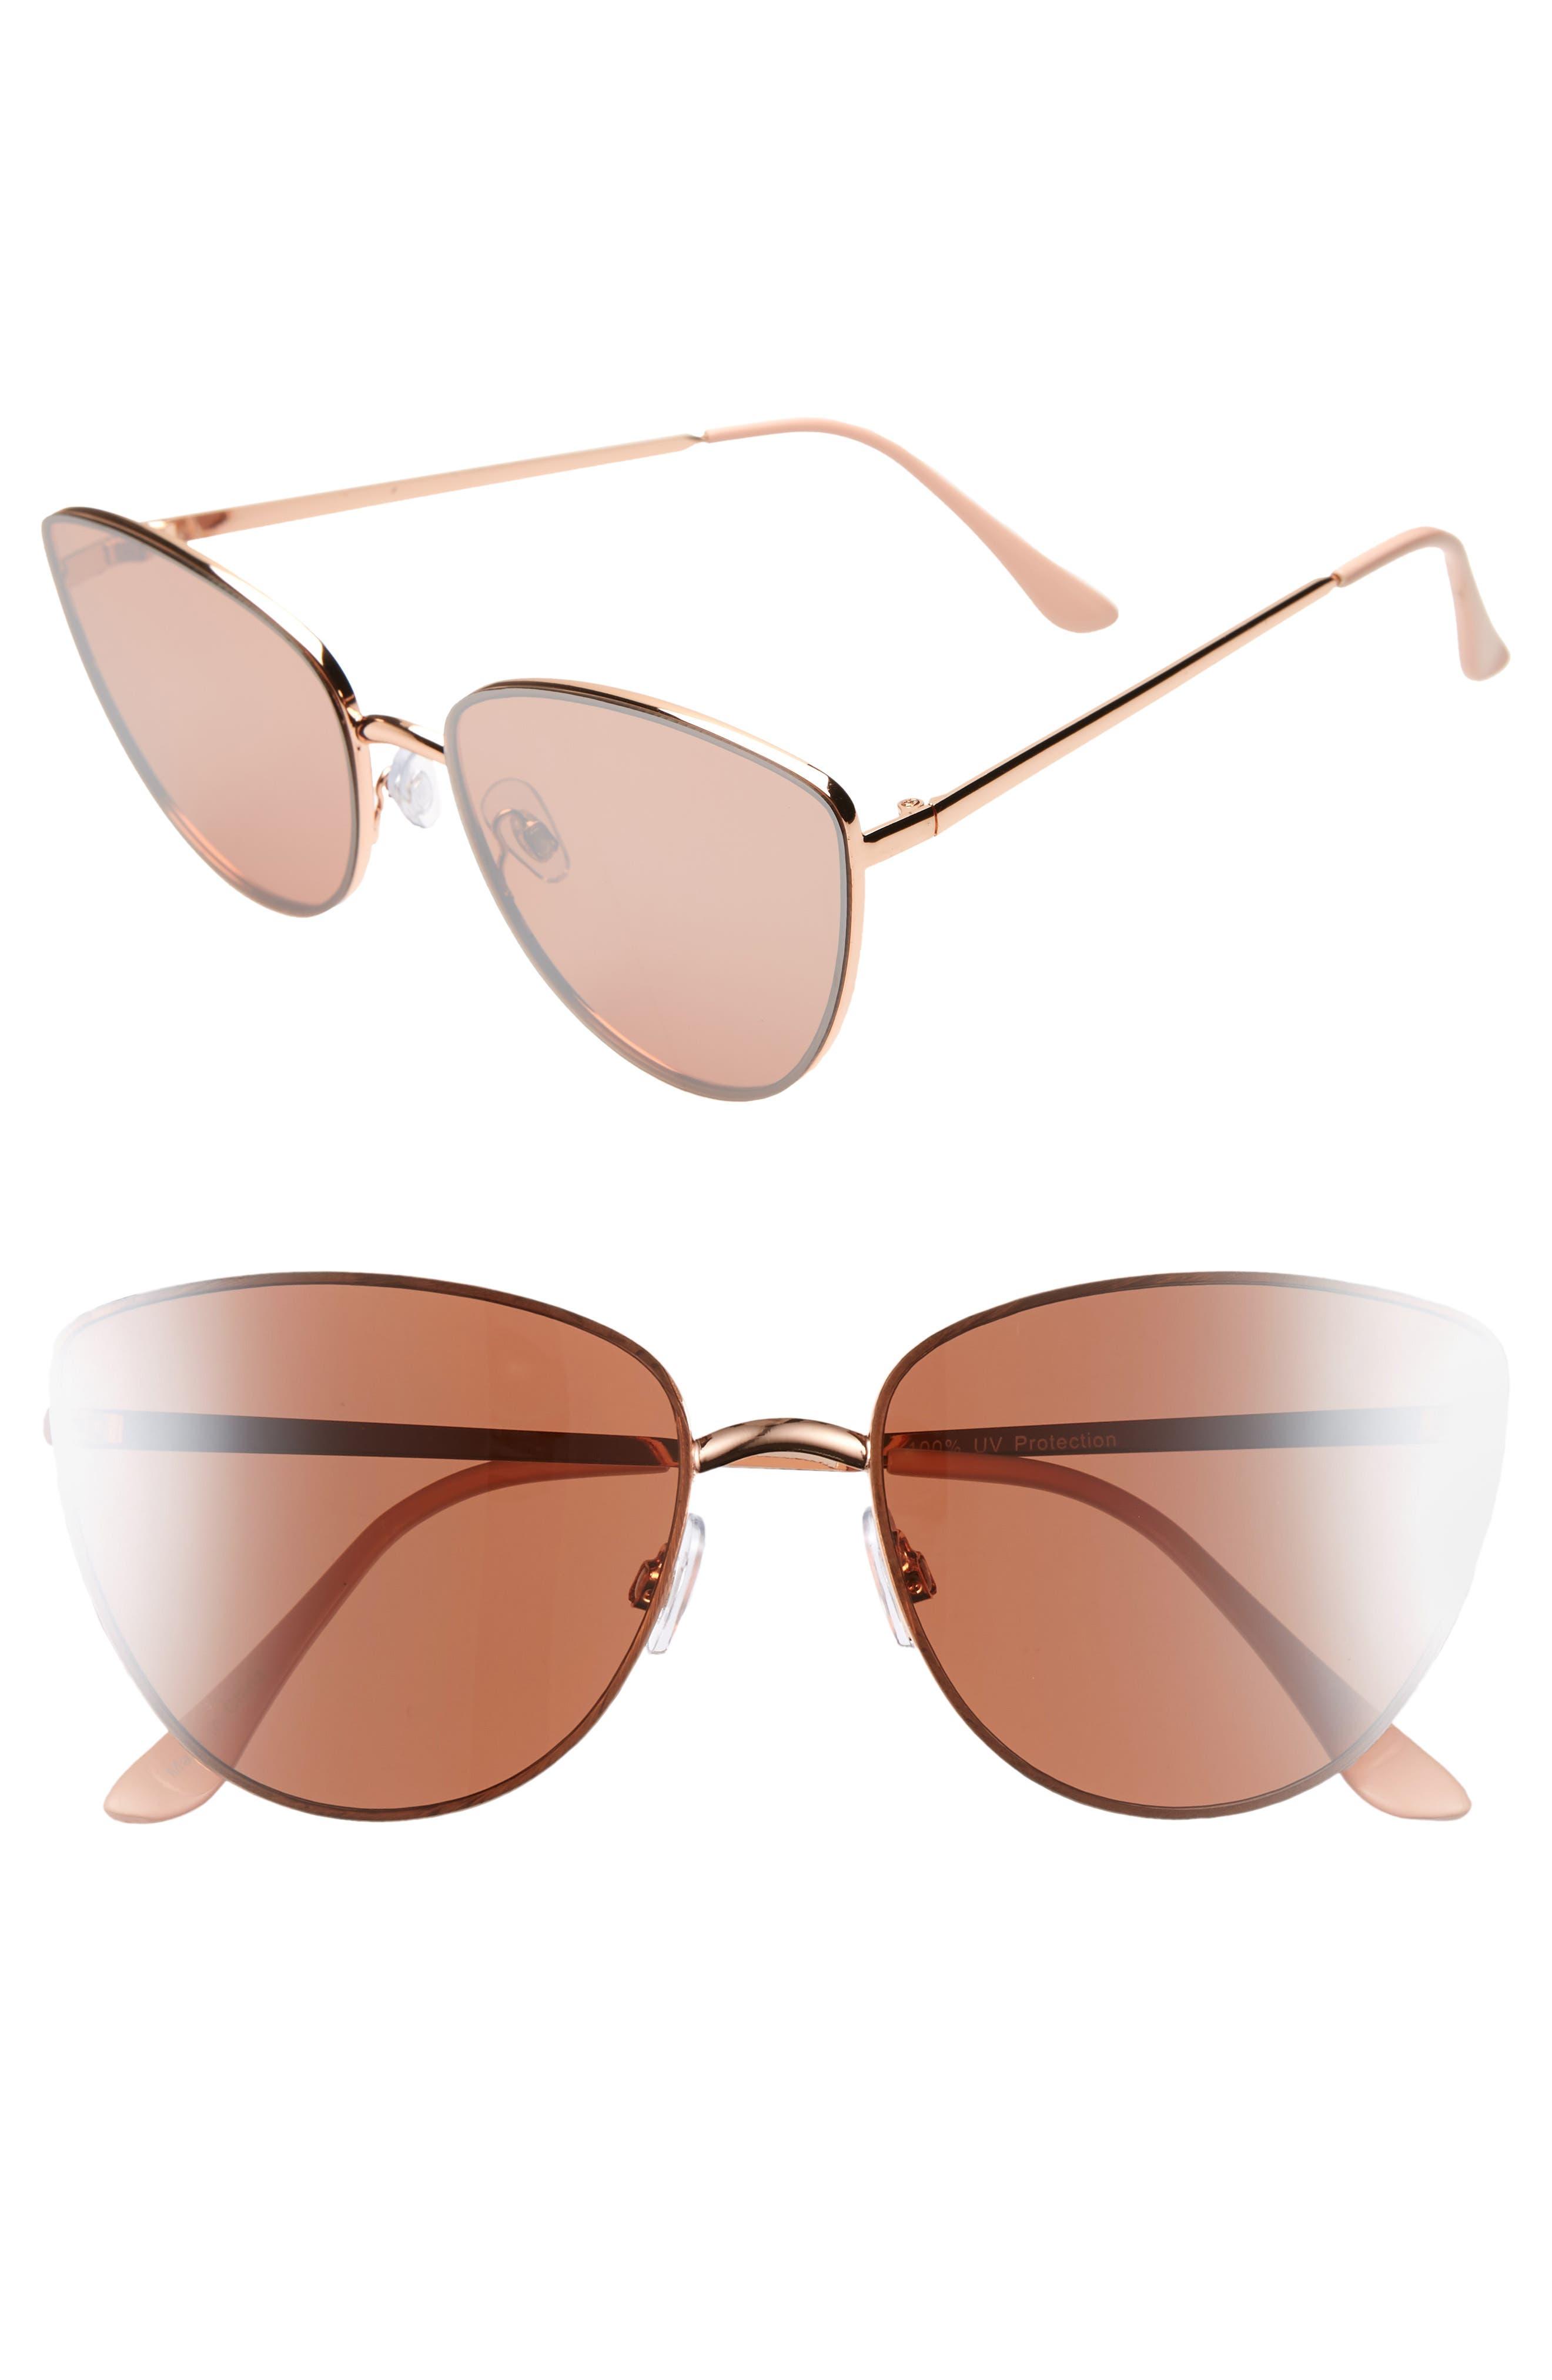 Rimless Cat Eye Sunglasses,                             Main thumbnail 1, color,                             ROSE GOLD